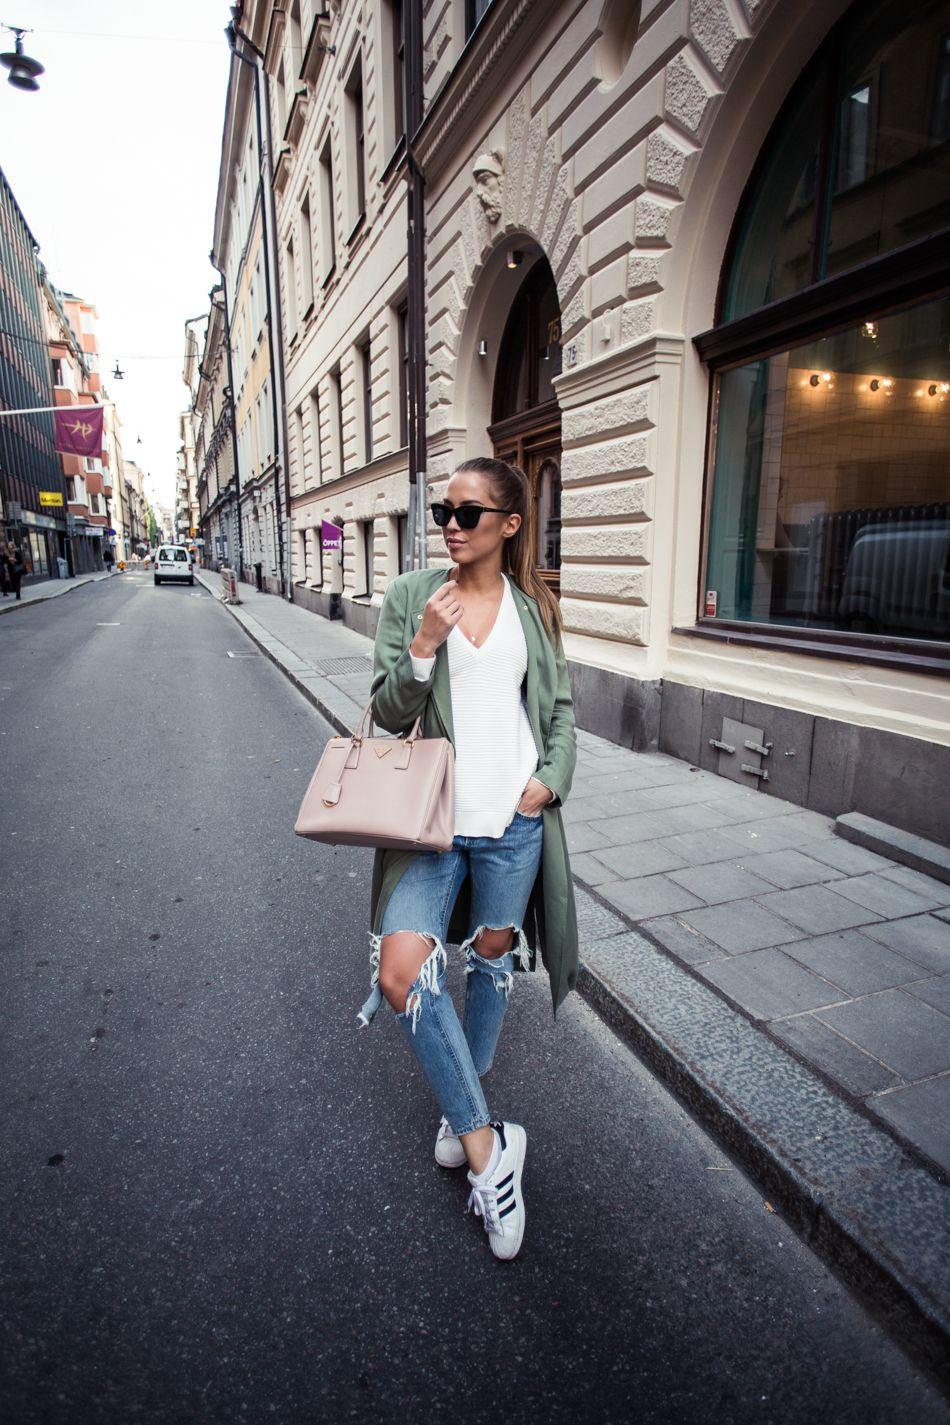 CASUALKenzas | Mode, Fashion inspo, Adidas superstar outfit